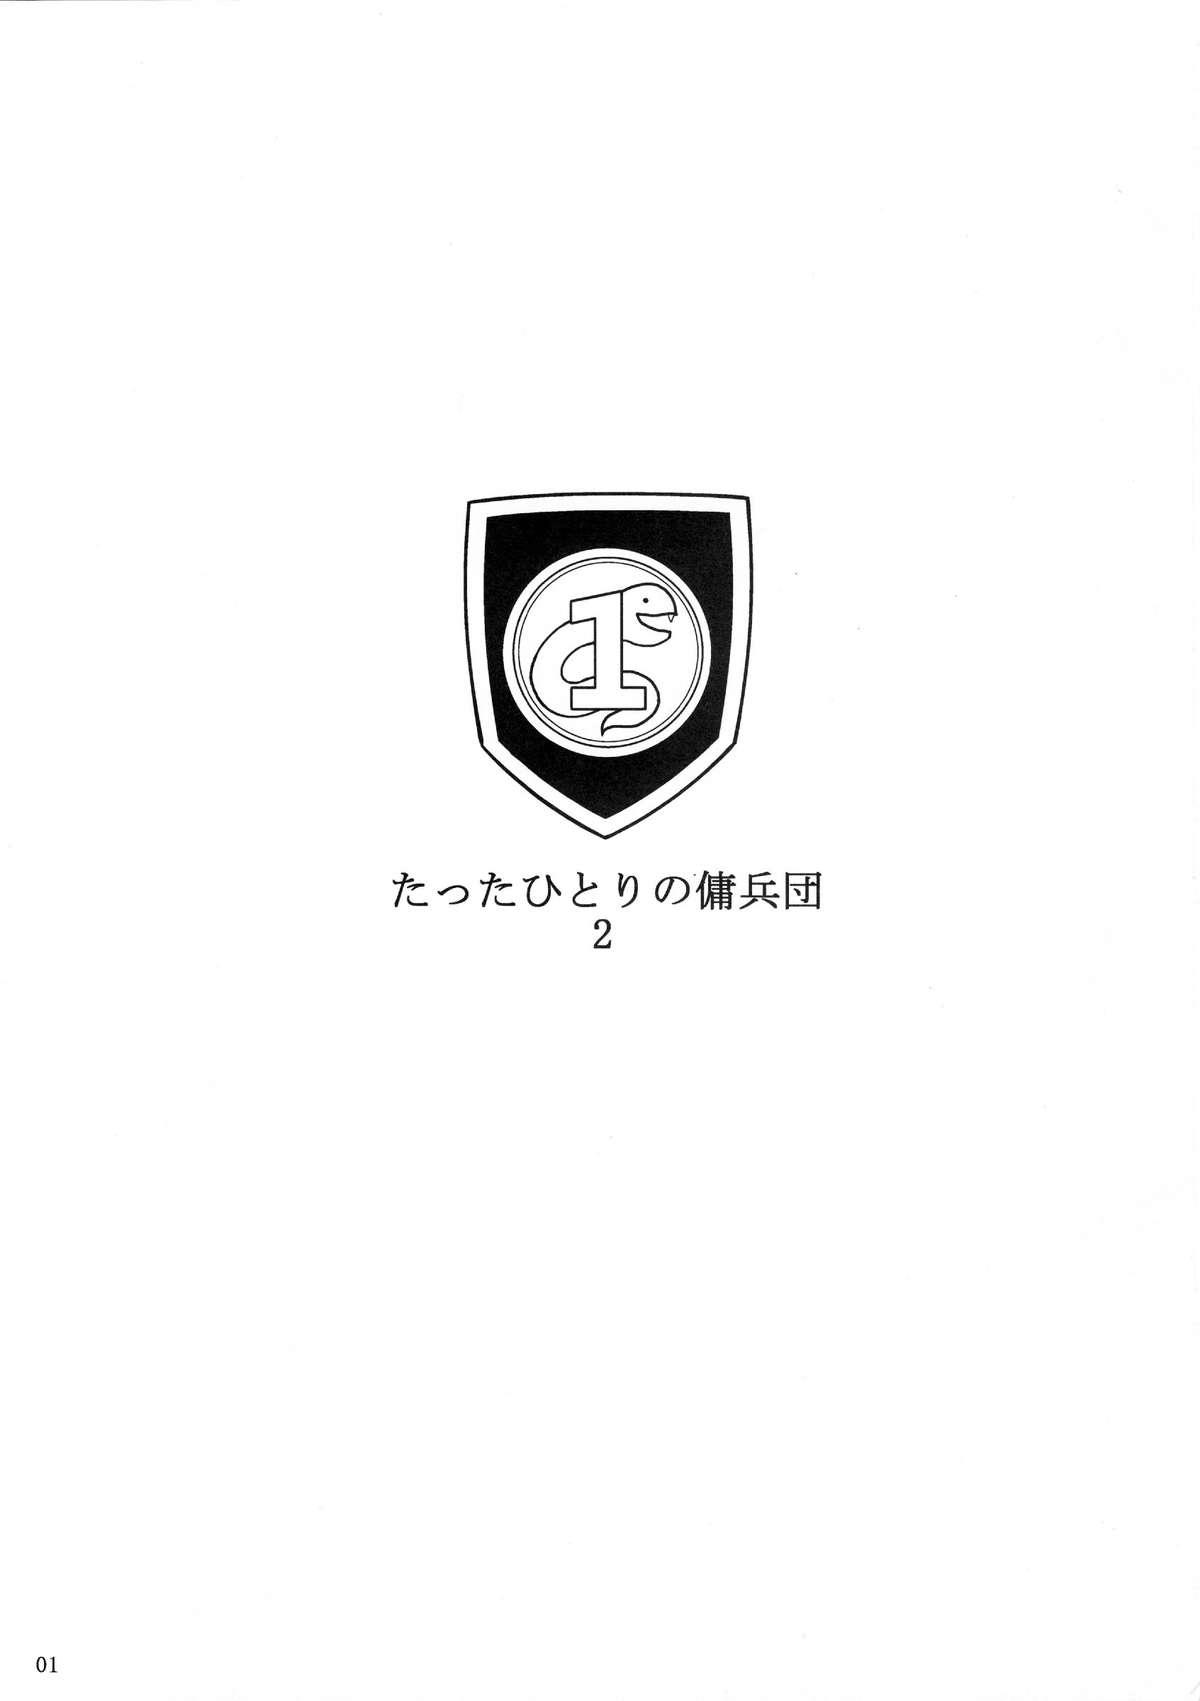 Tatta Hitori no Youheidan 2 | One-Man Mercenary Army 2 1